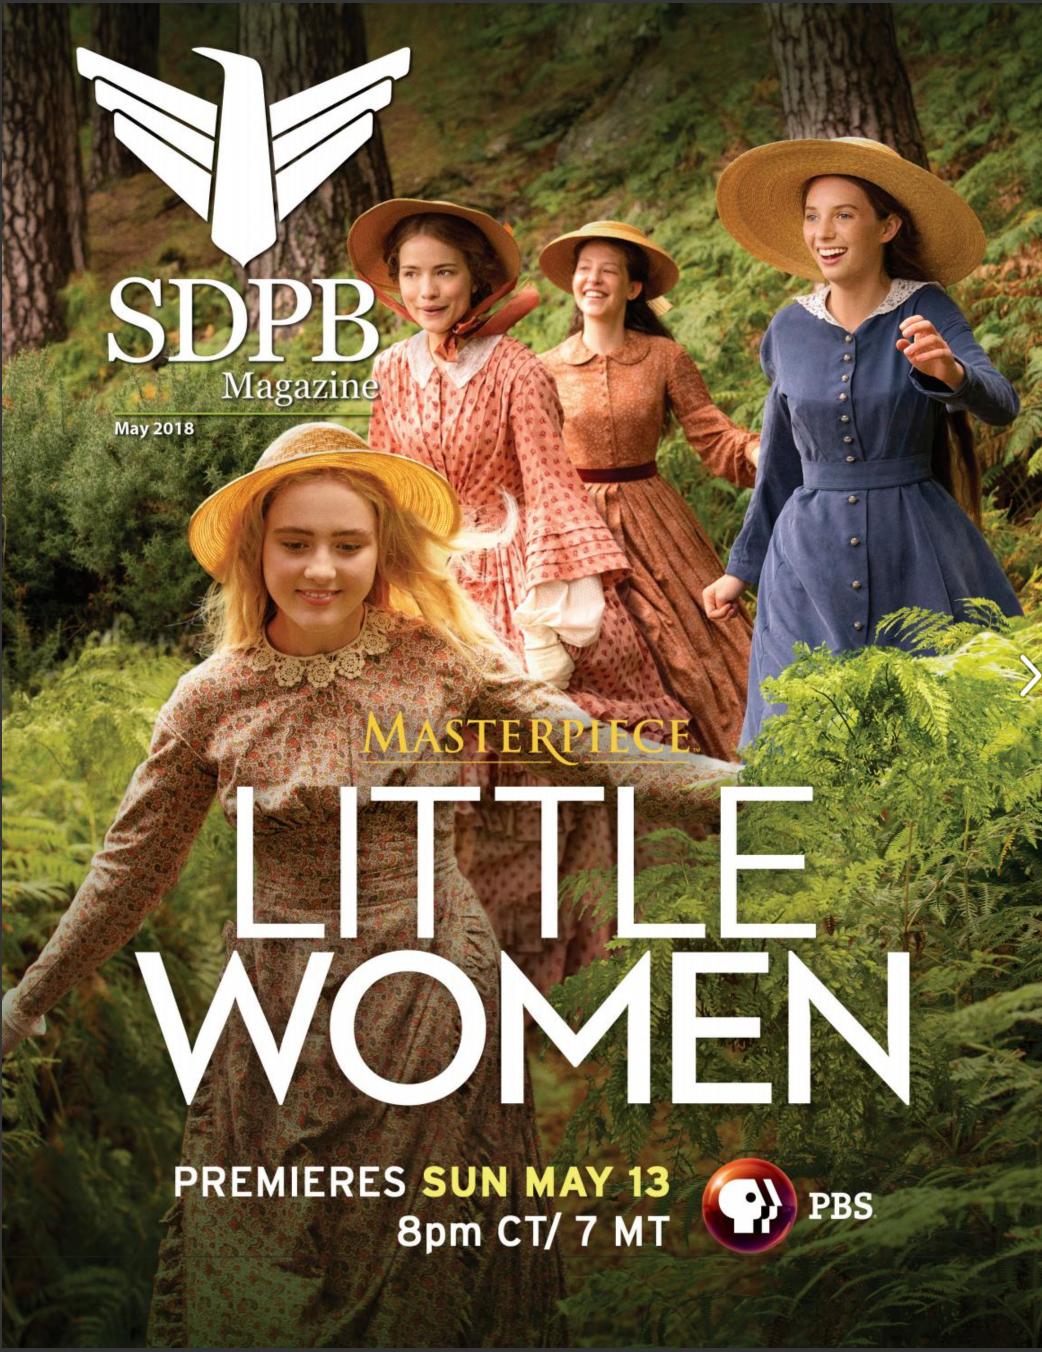 SDPB Magazine